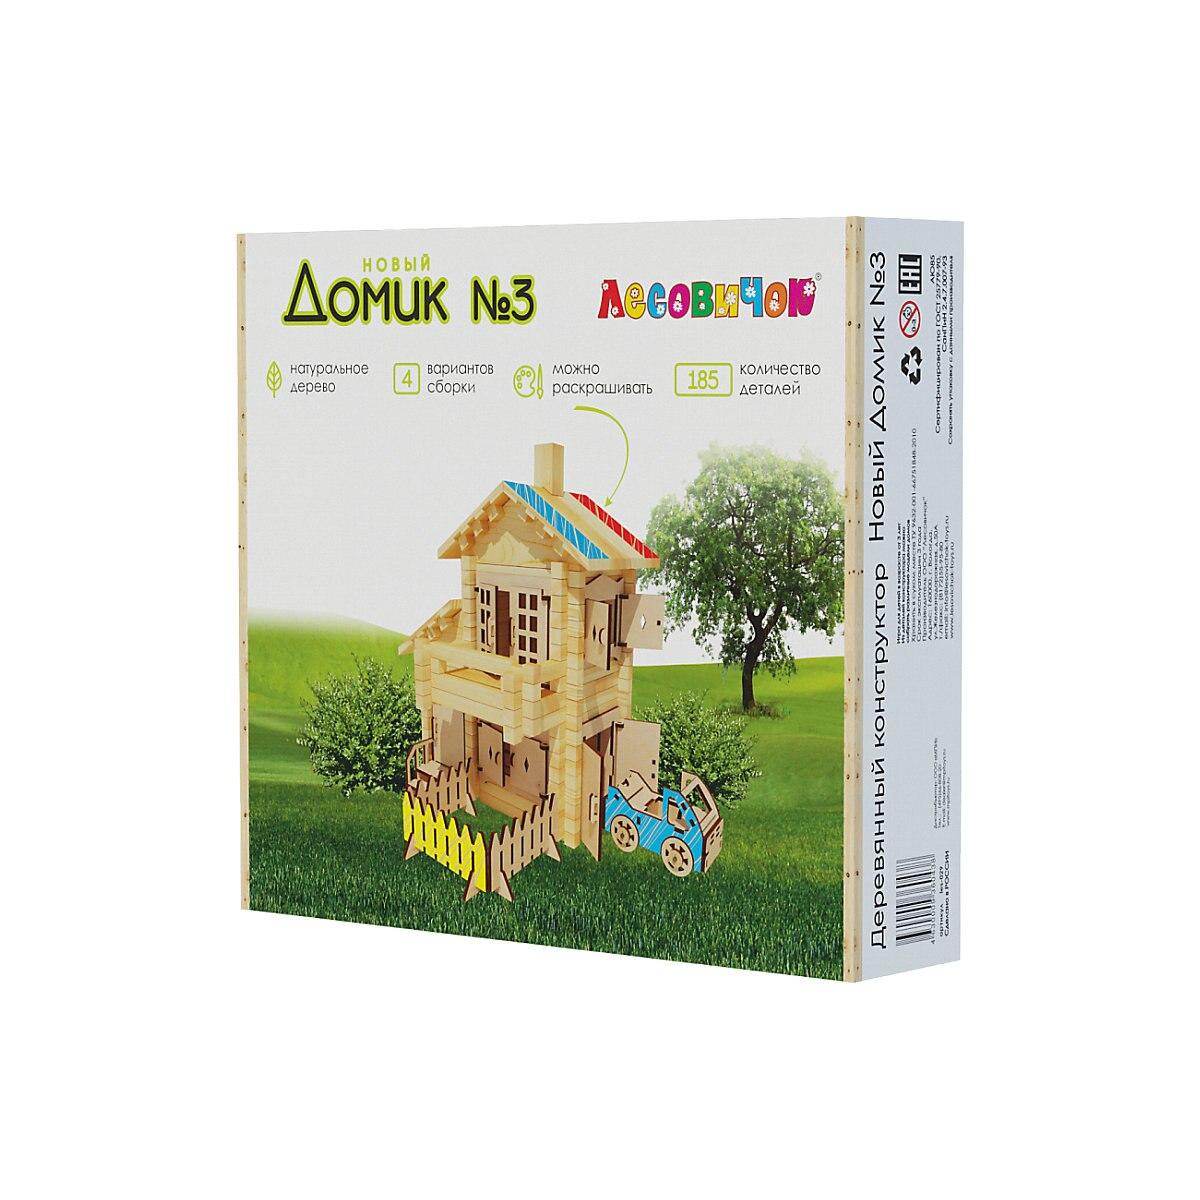 LESOVICHOK Wooden Blocks 10986130 education toys constructor cubes toy lesovichok wooden blocks 10986114 education toys constructor cubes toy